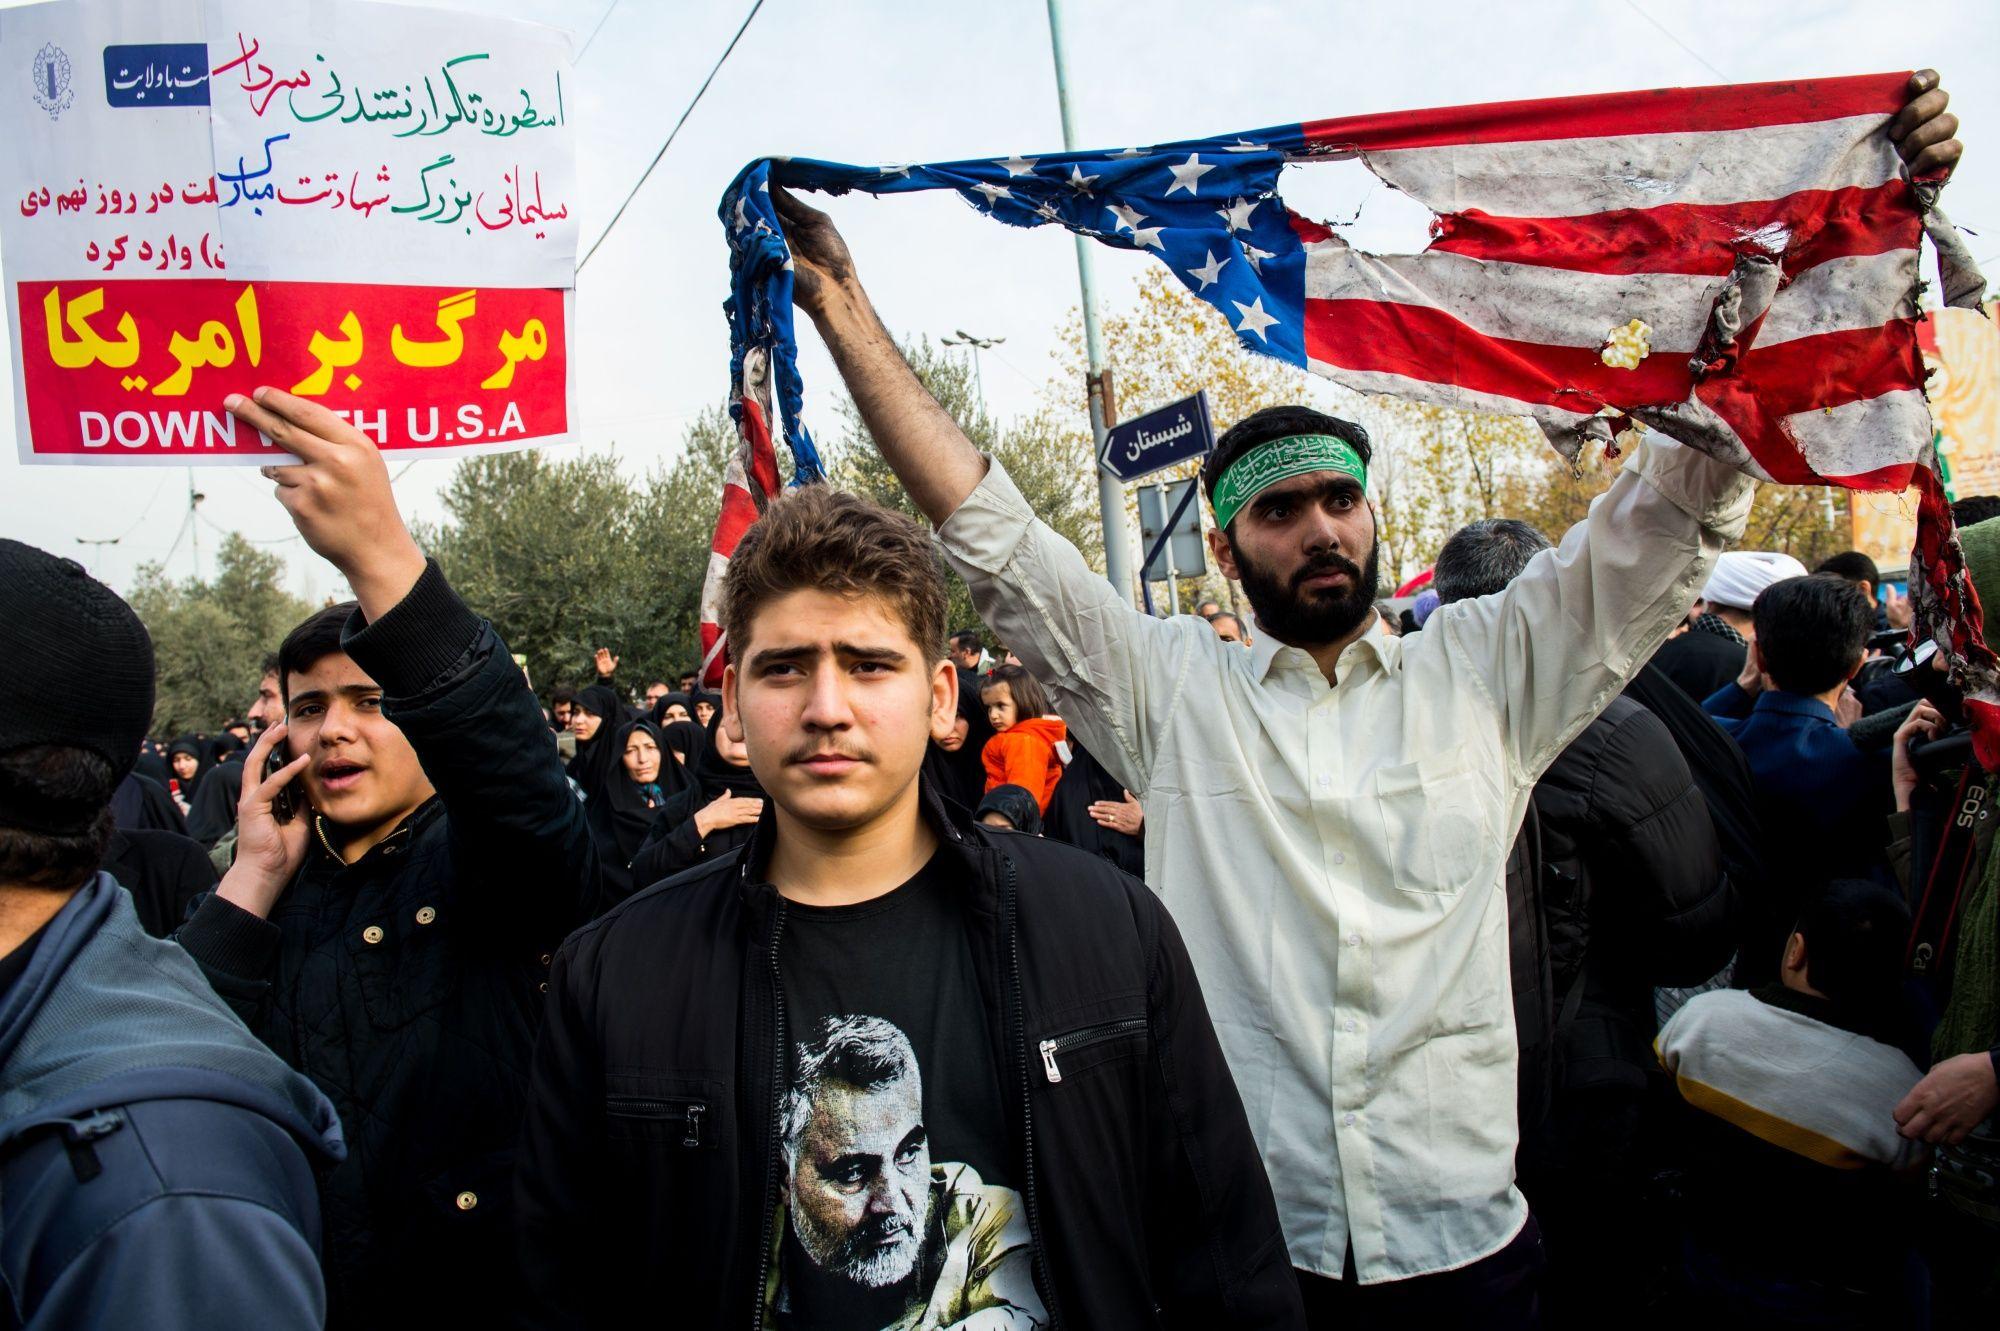 Defense Stocks Rally as Citi Sees Iran Risk Boosting Spending